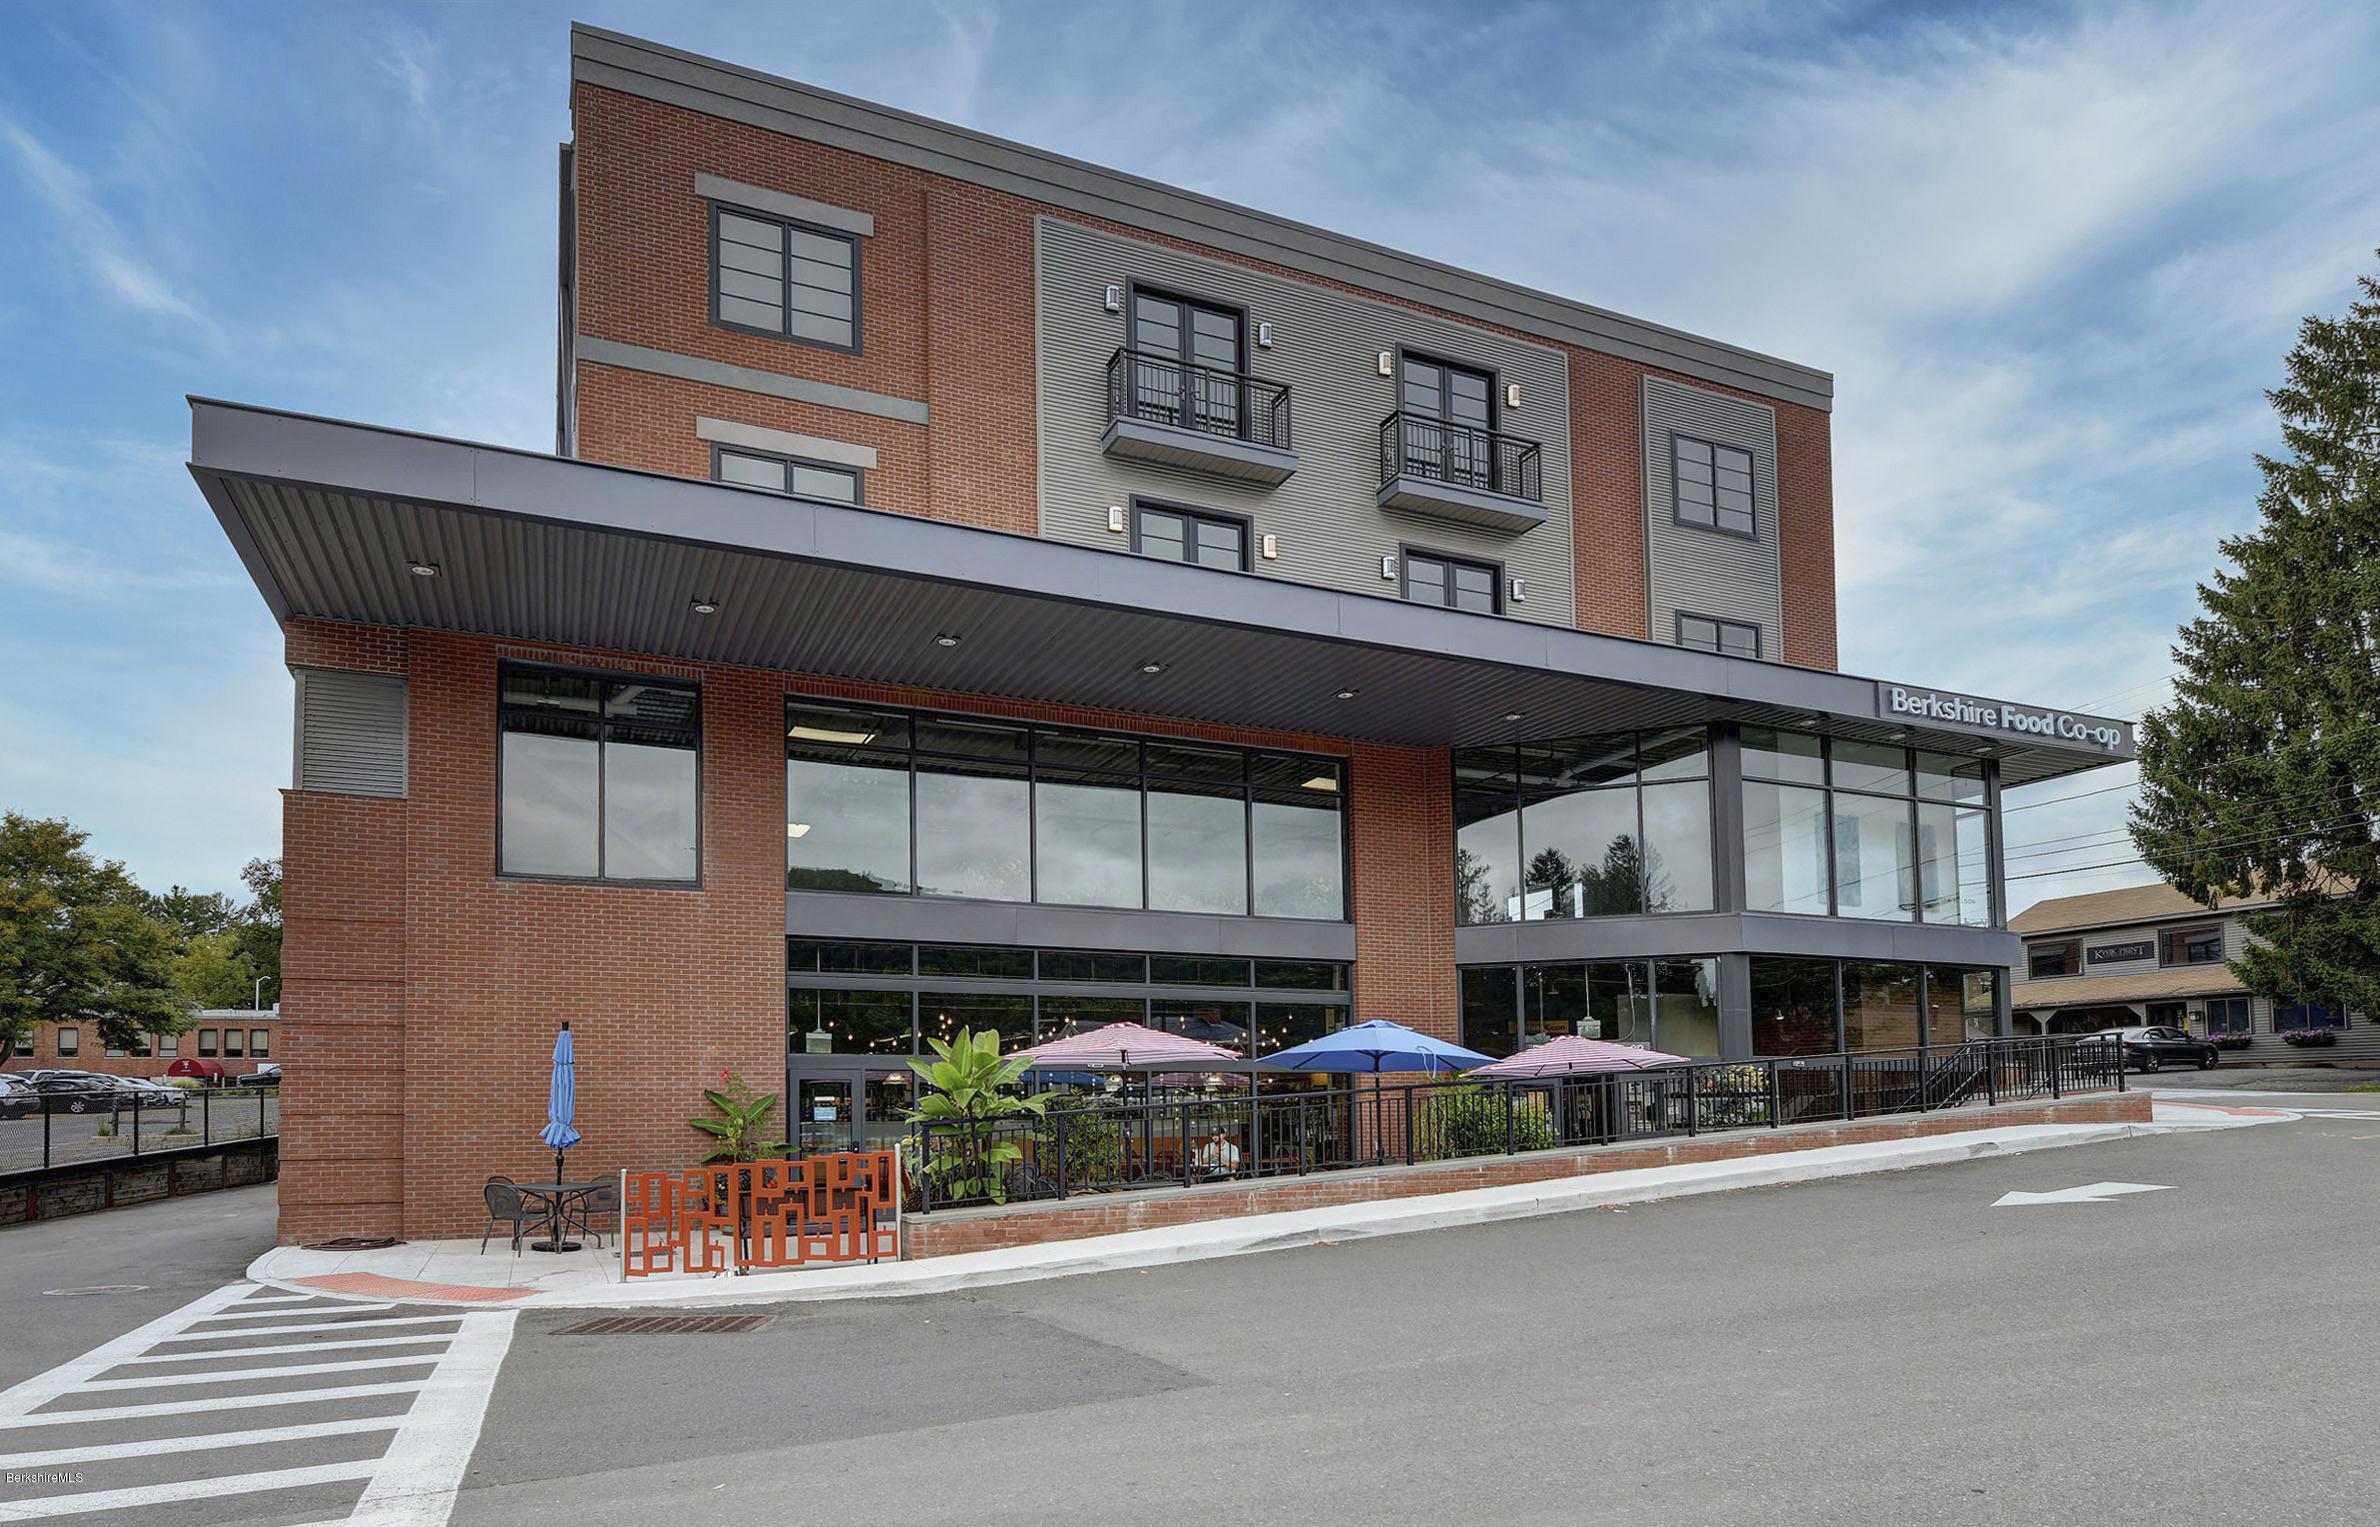 34 Bridge, Great Barrington, Massachusetts 01230, 2 Bedrooms Bedrooms, 4 Rooms Rooms,2 BathroomsBathrooms,Condominium,For Sale,Bridge,232335